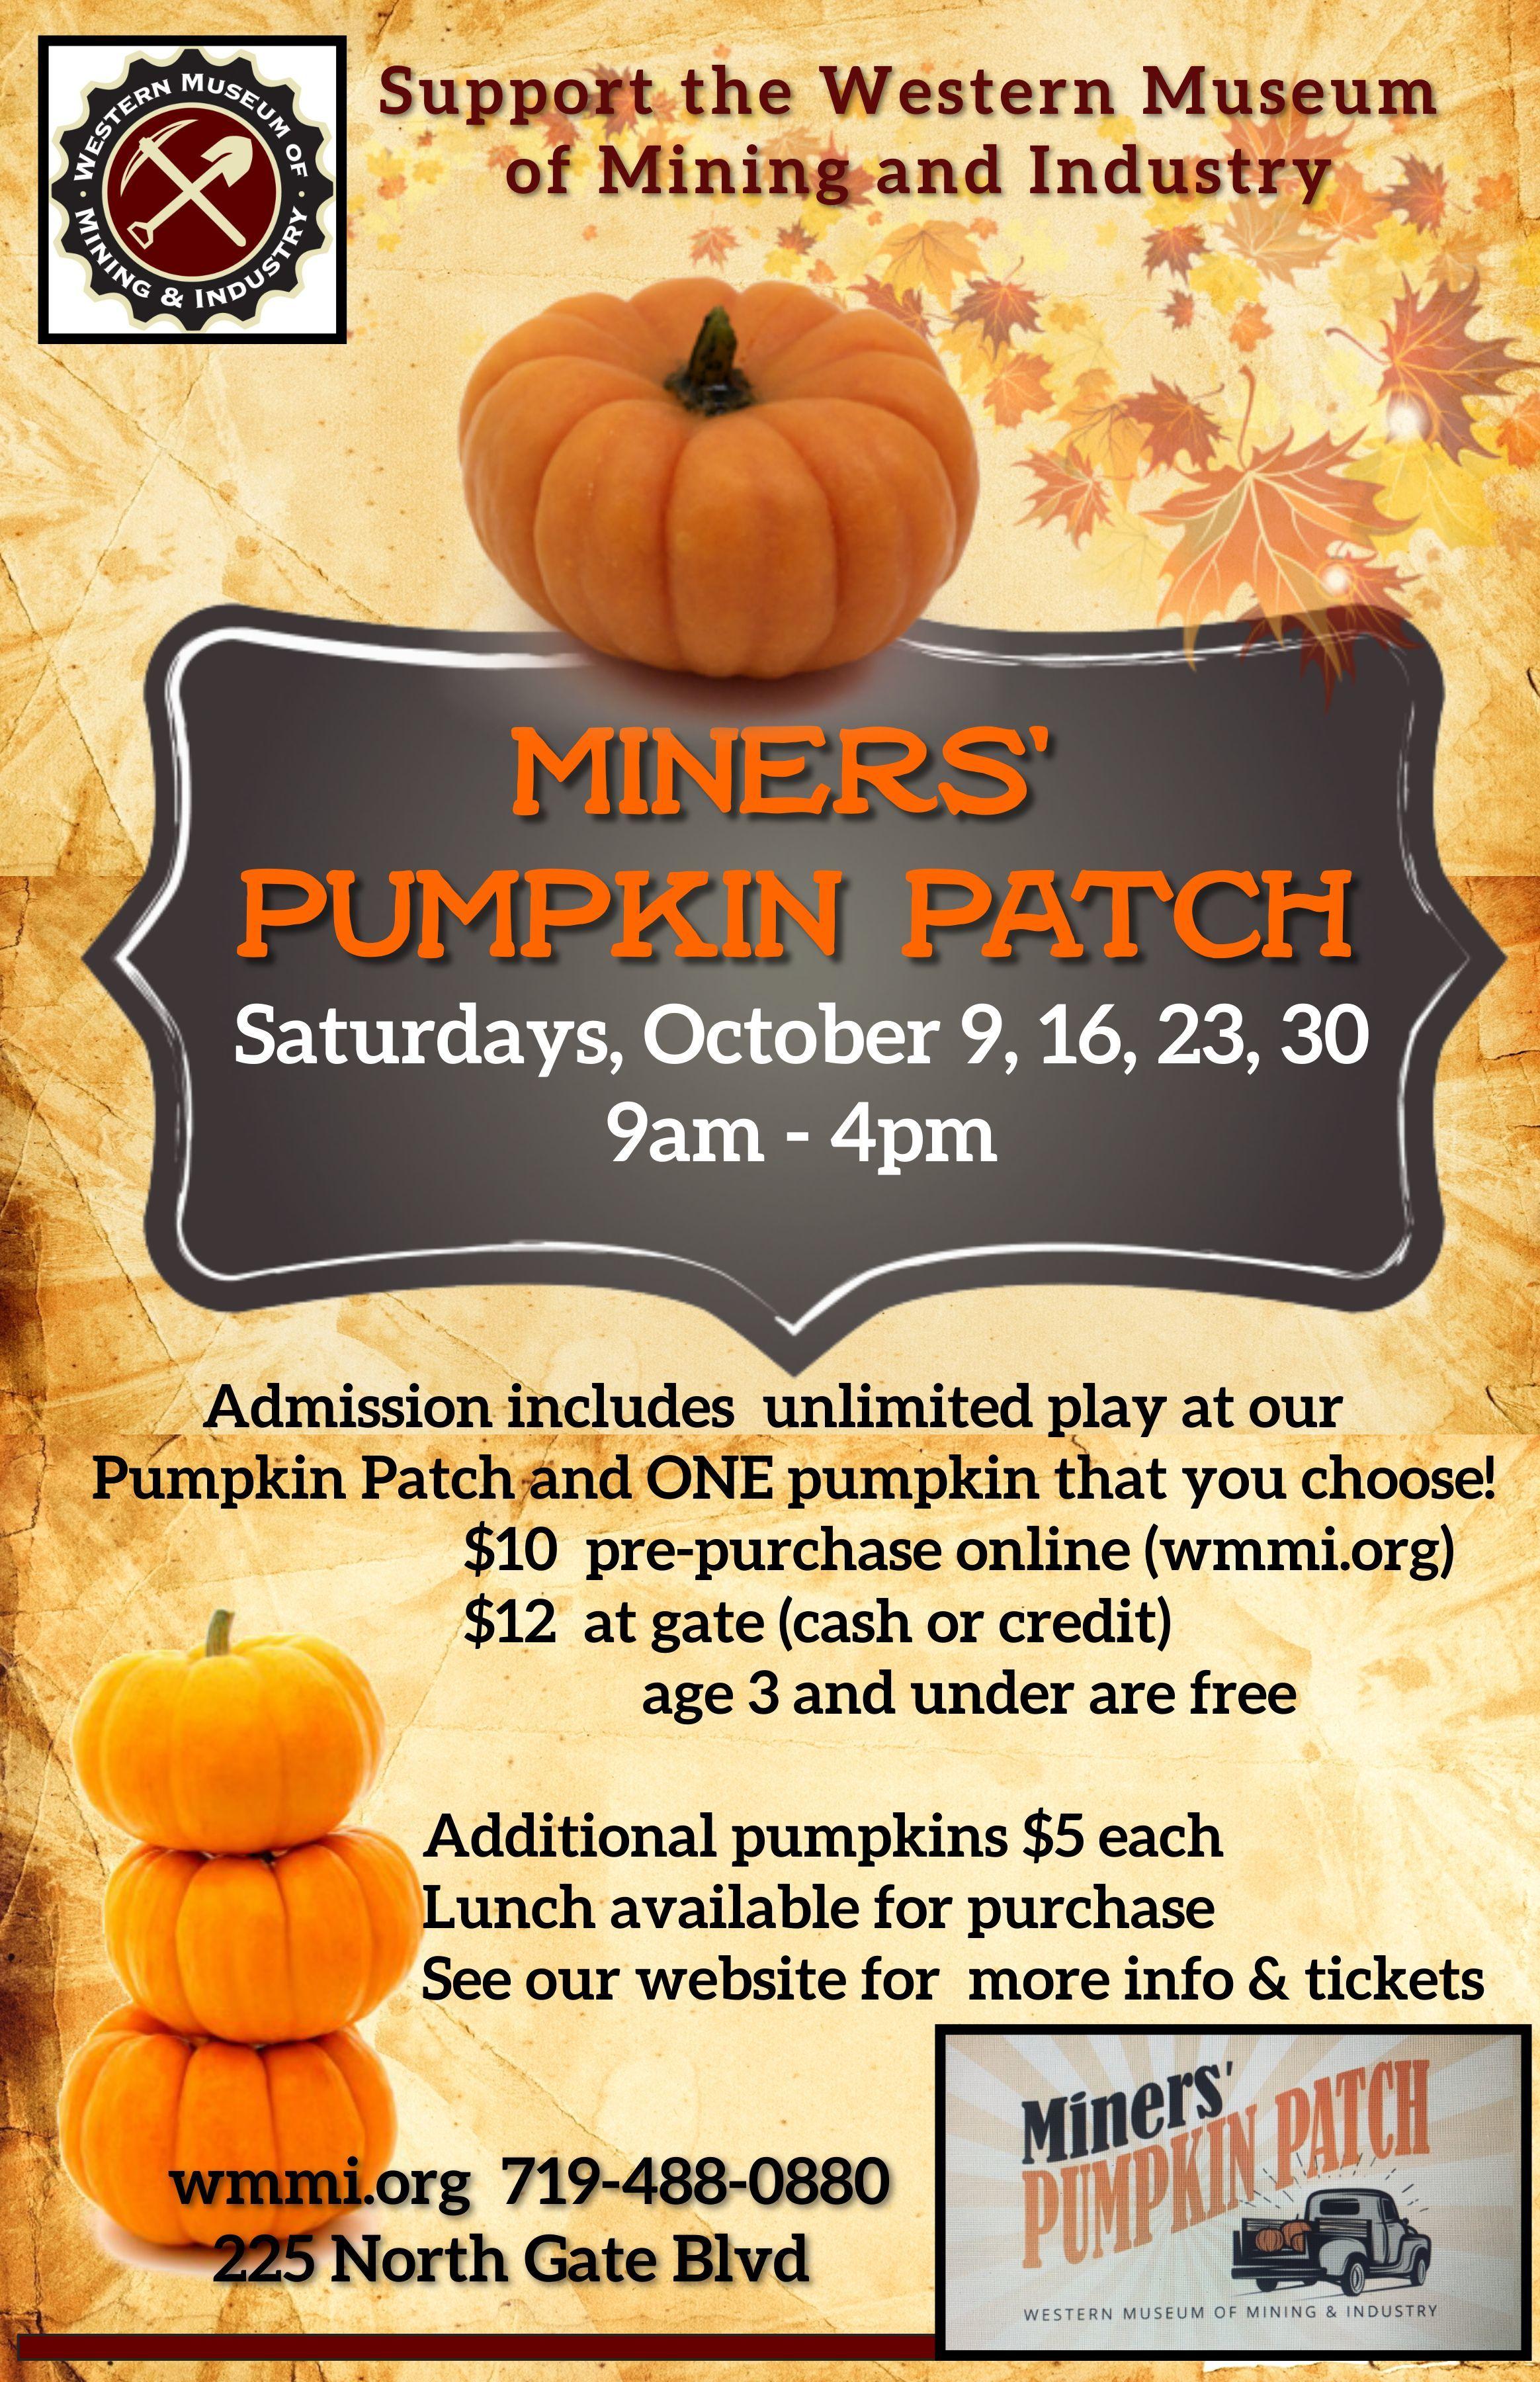 Miners' Pumpkin Patch